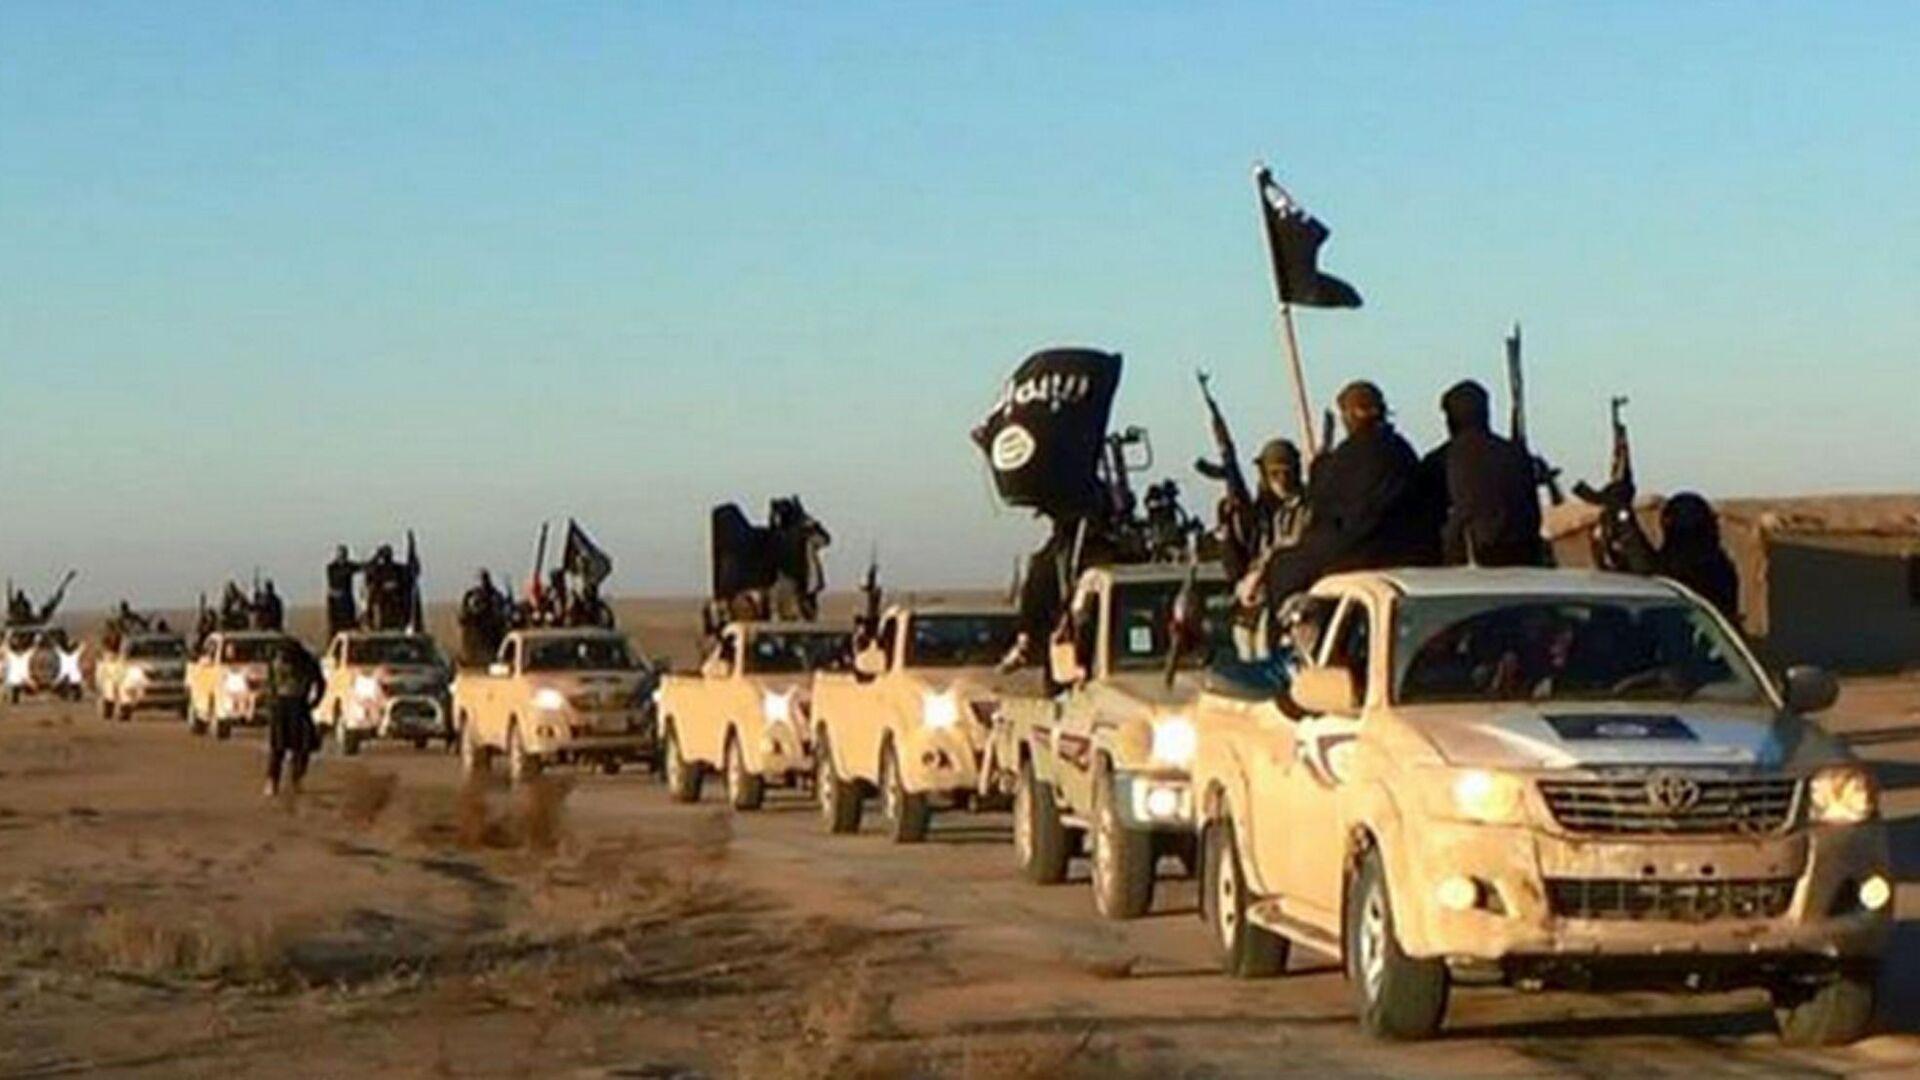 Los terroristas del Estado Islámico  - Sputnik Mundo, 1920, 04.03.2021